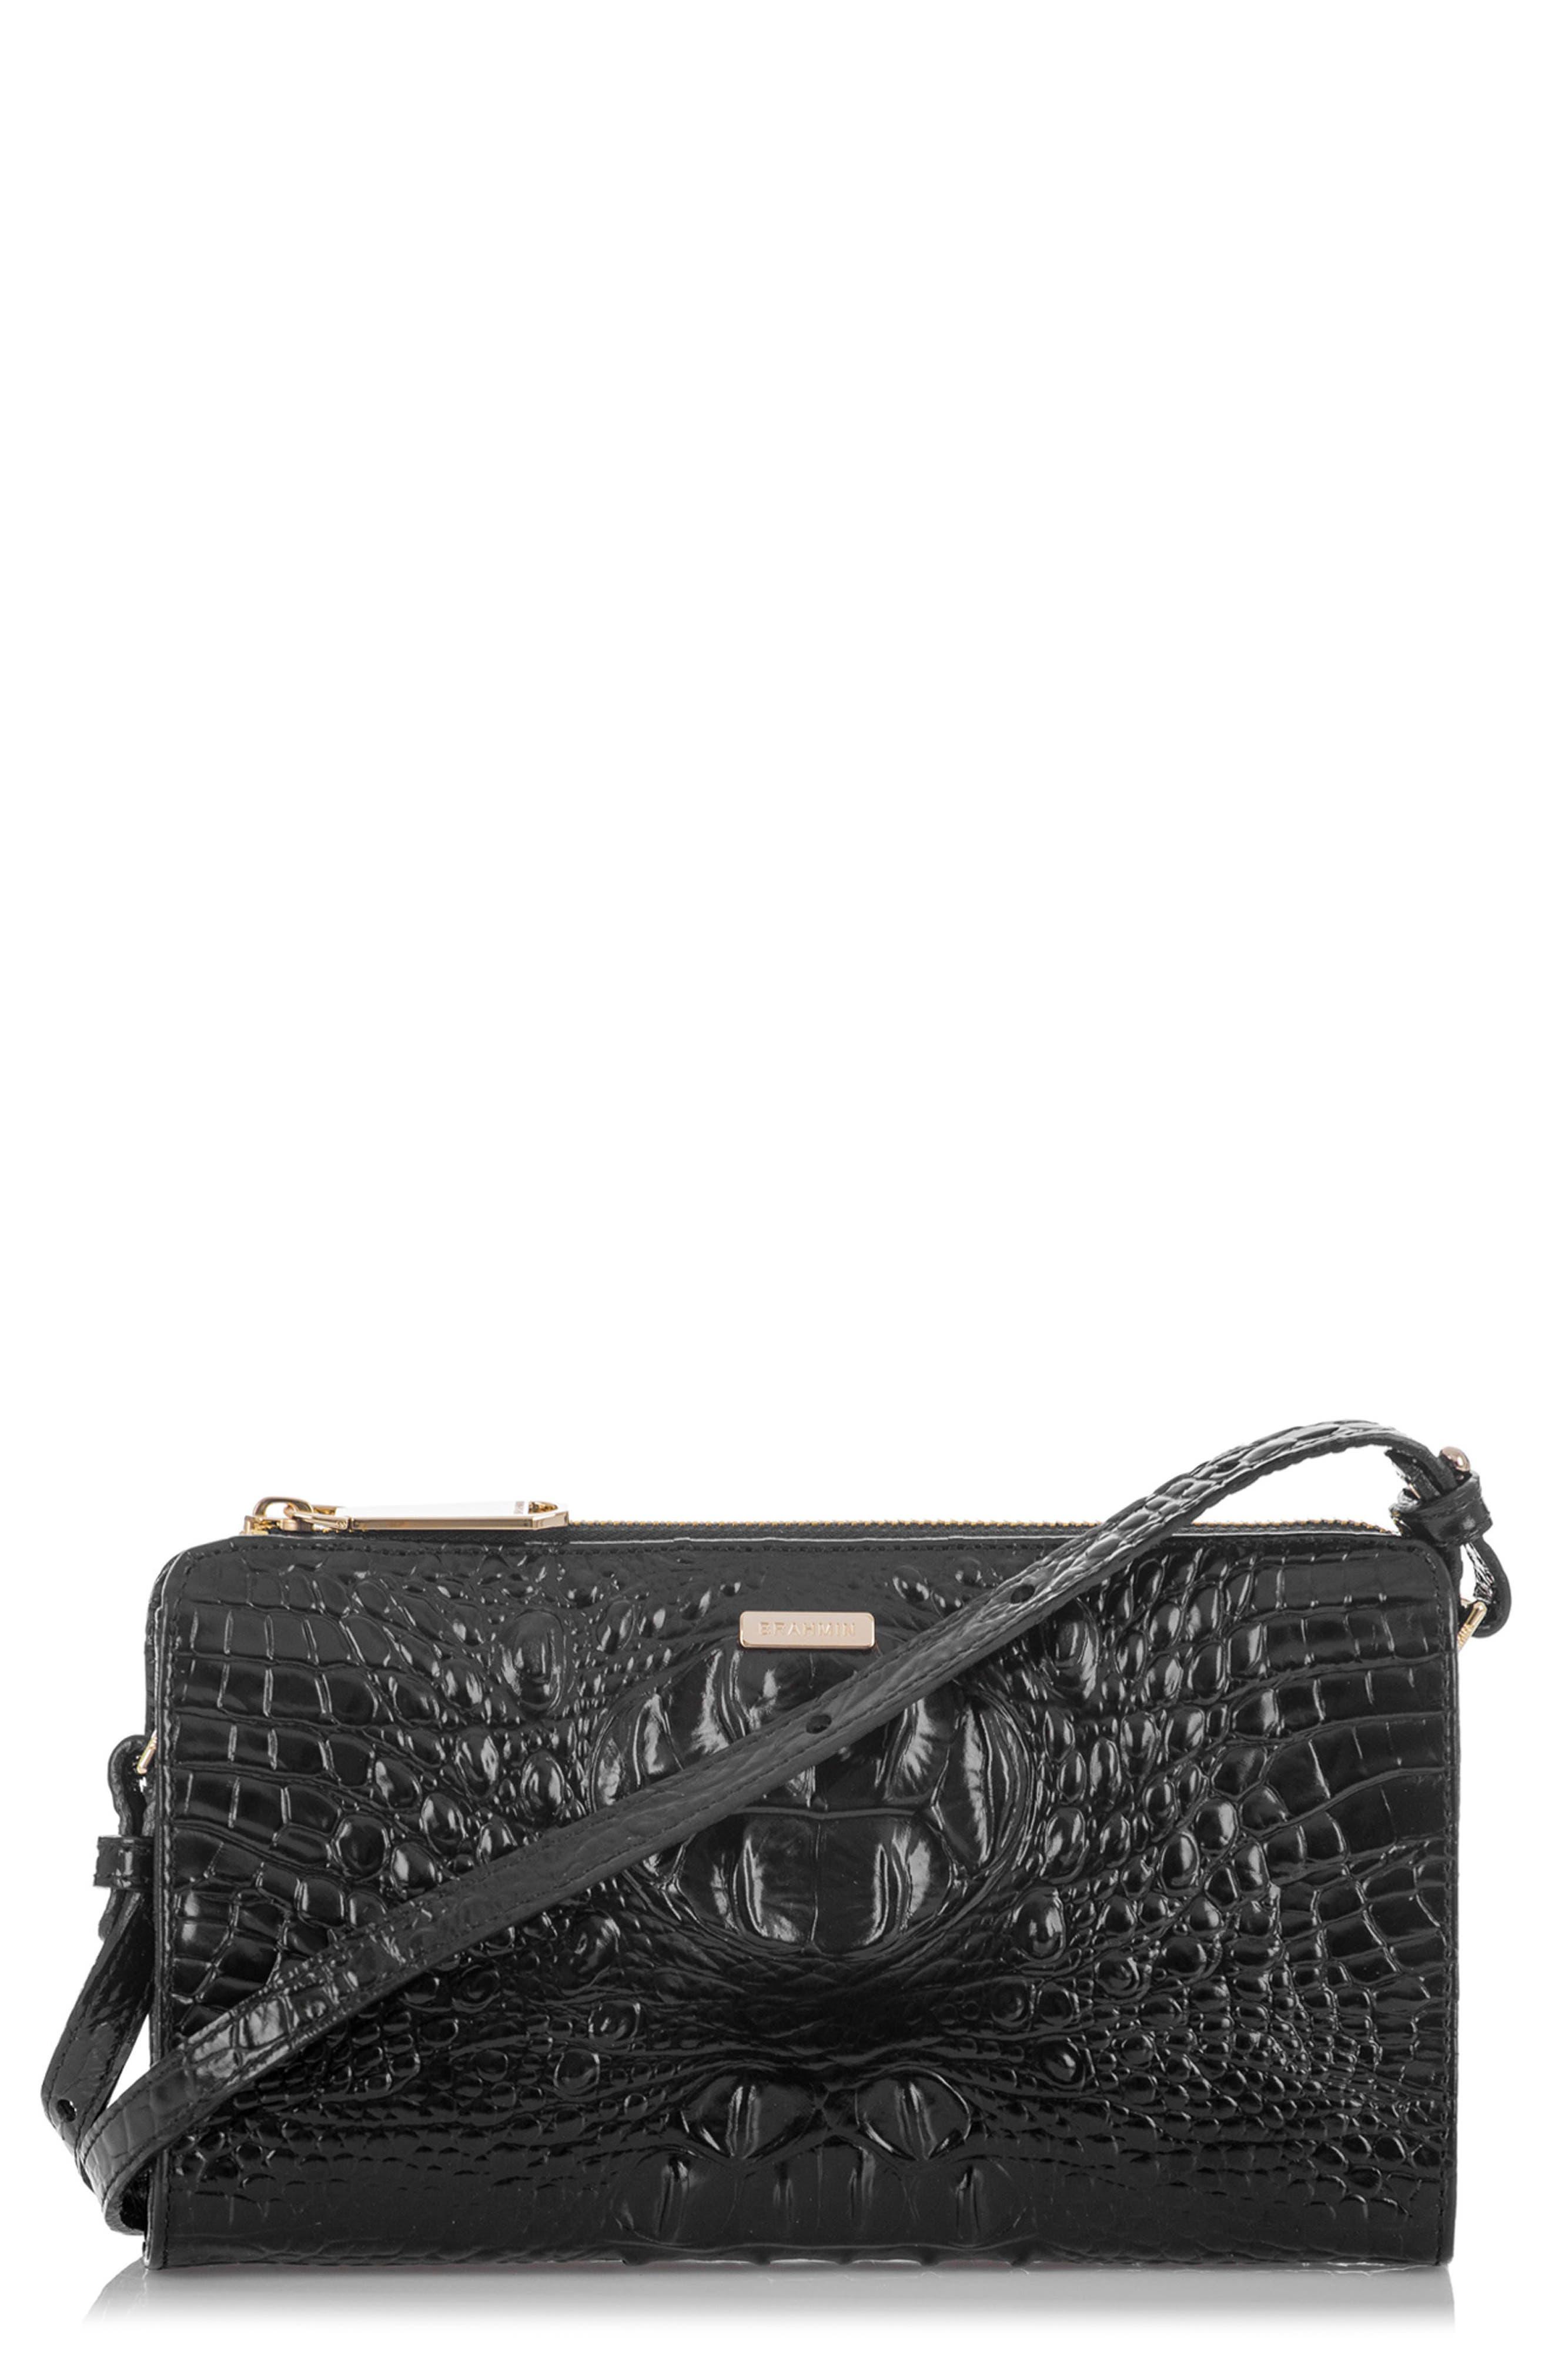 Main Image - Brahmin Sienna Leather Crossbody Bag